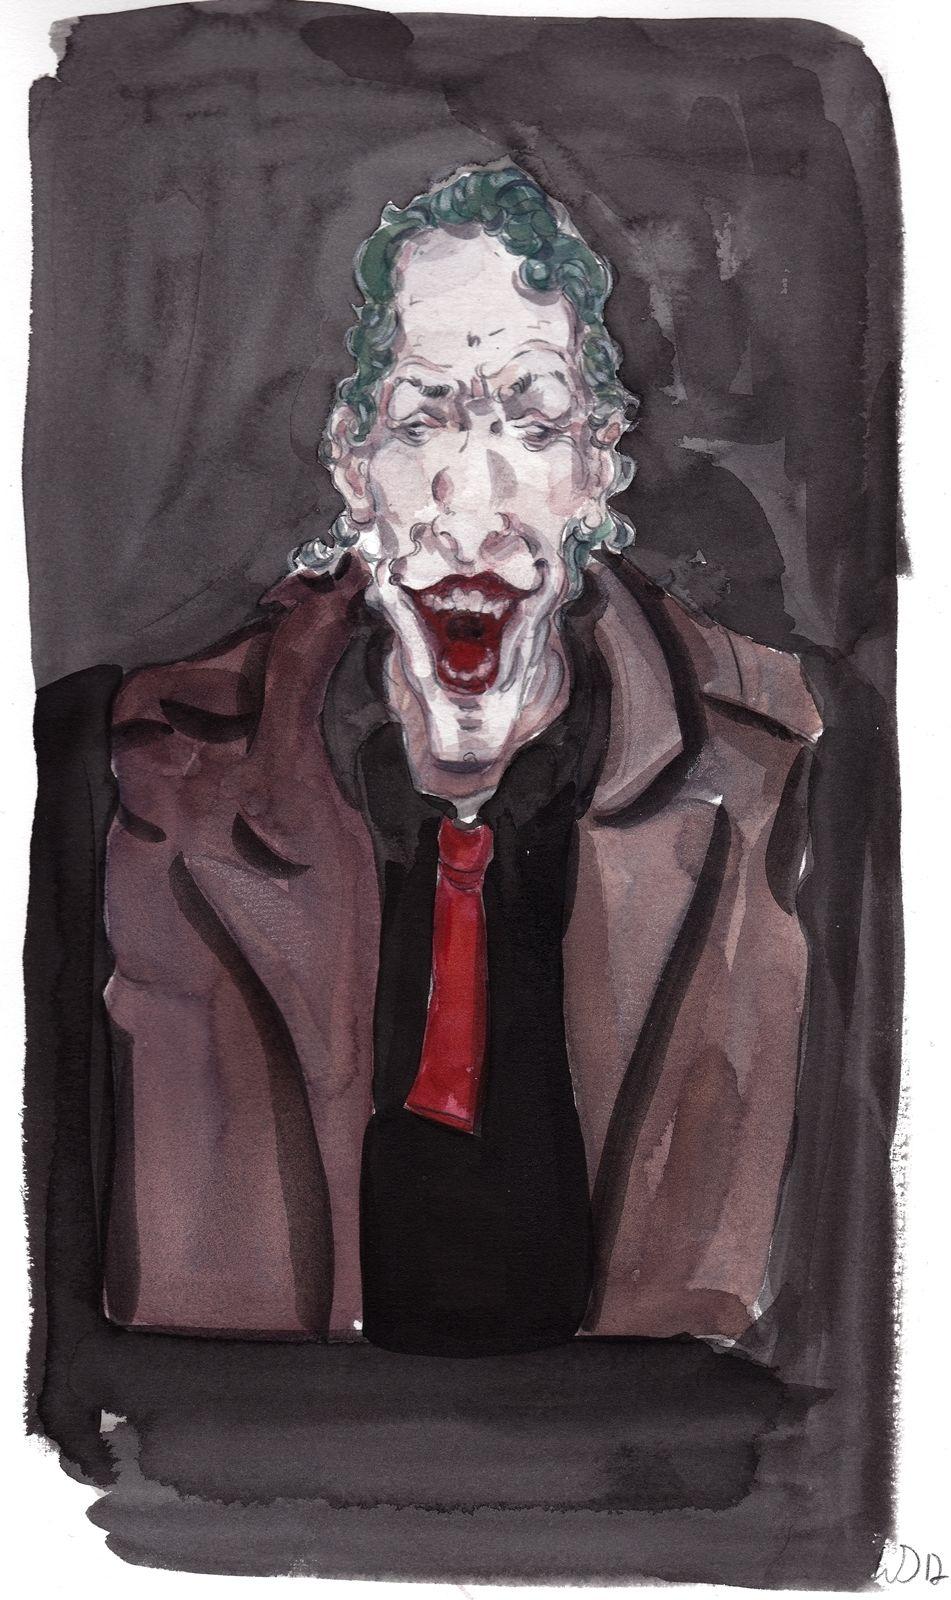 joker clown b se joker illustrationen von daniel. Black Bedroom Furniture Sets. Home Design Ideas